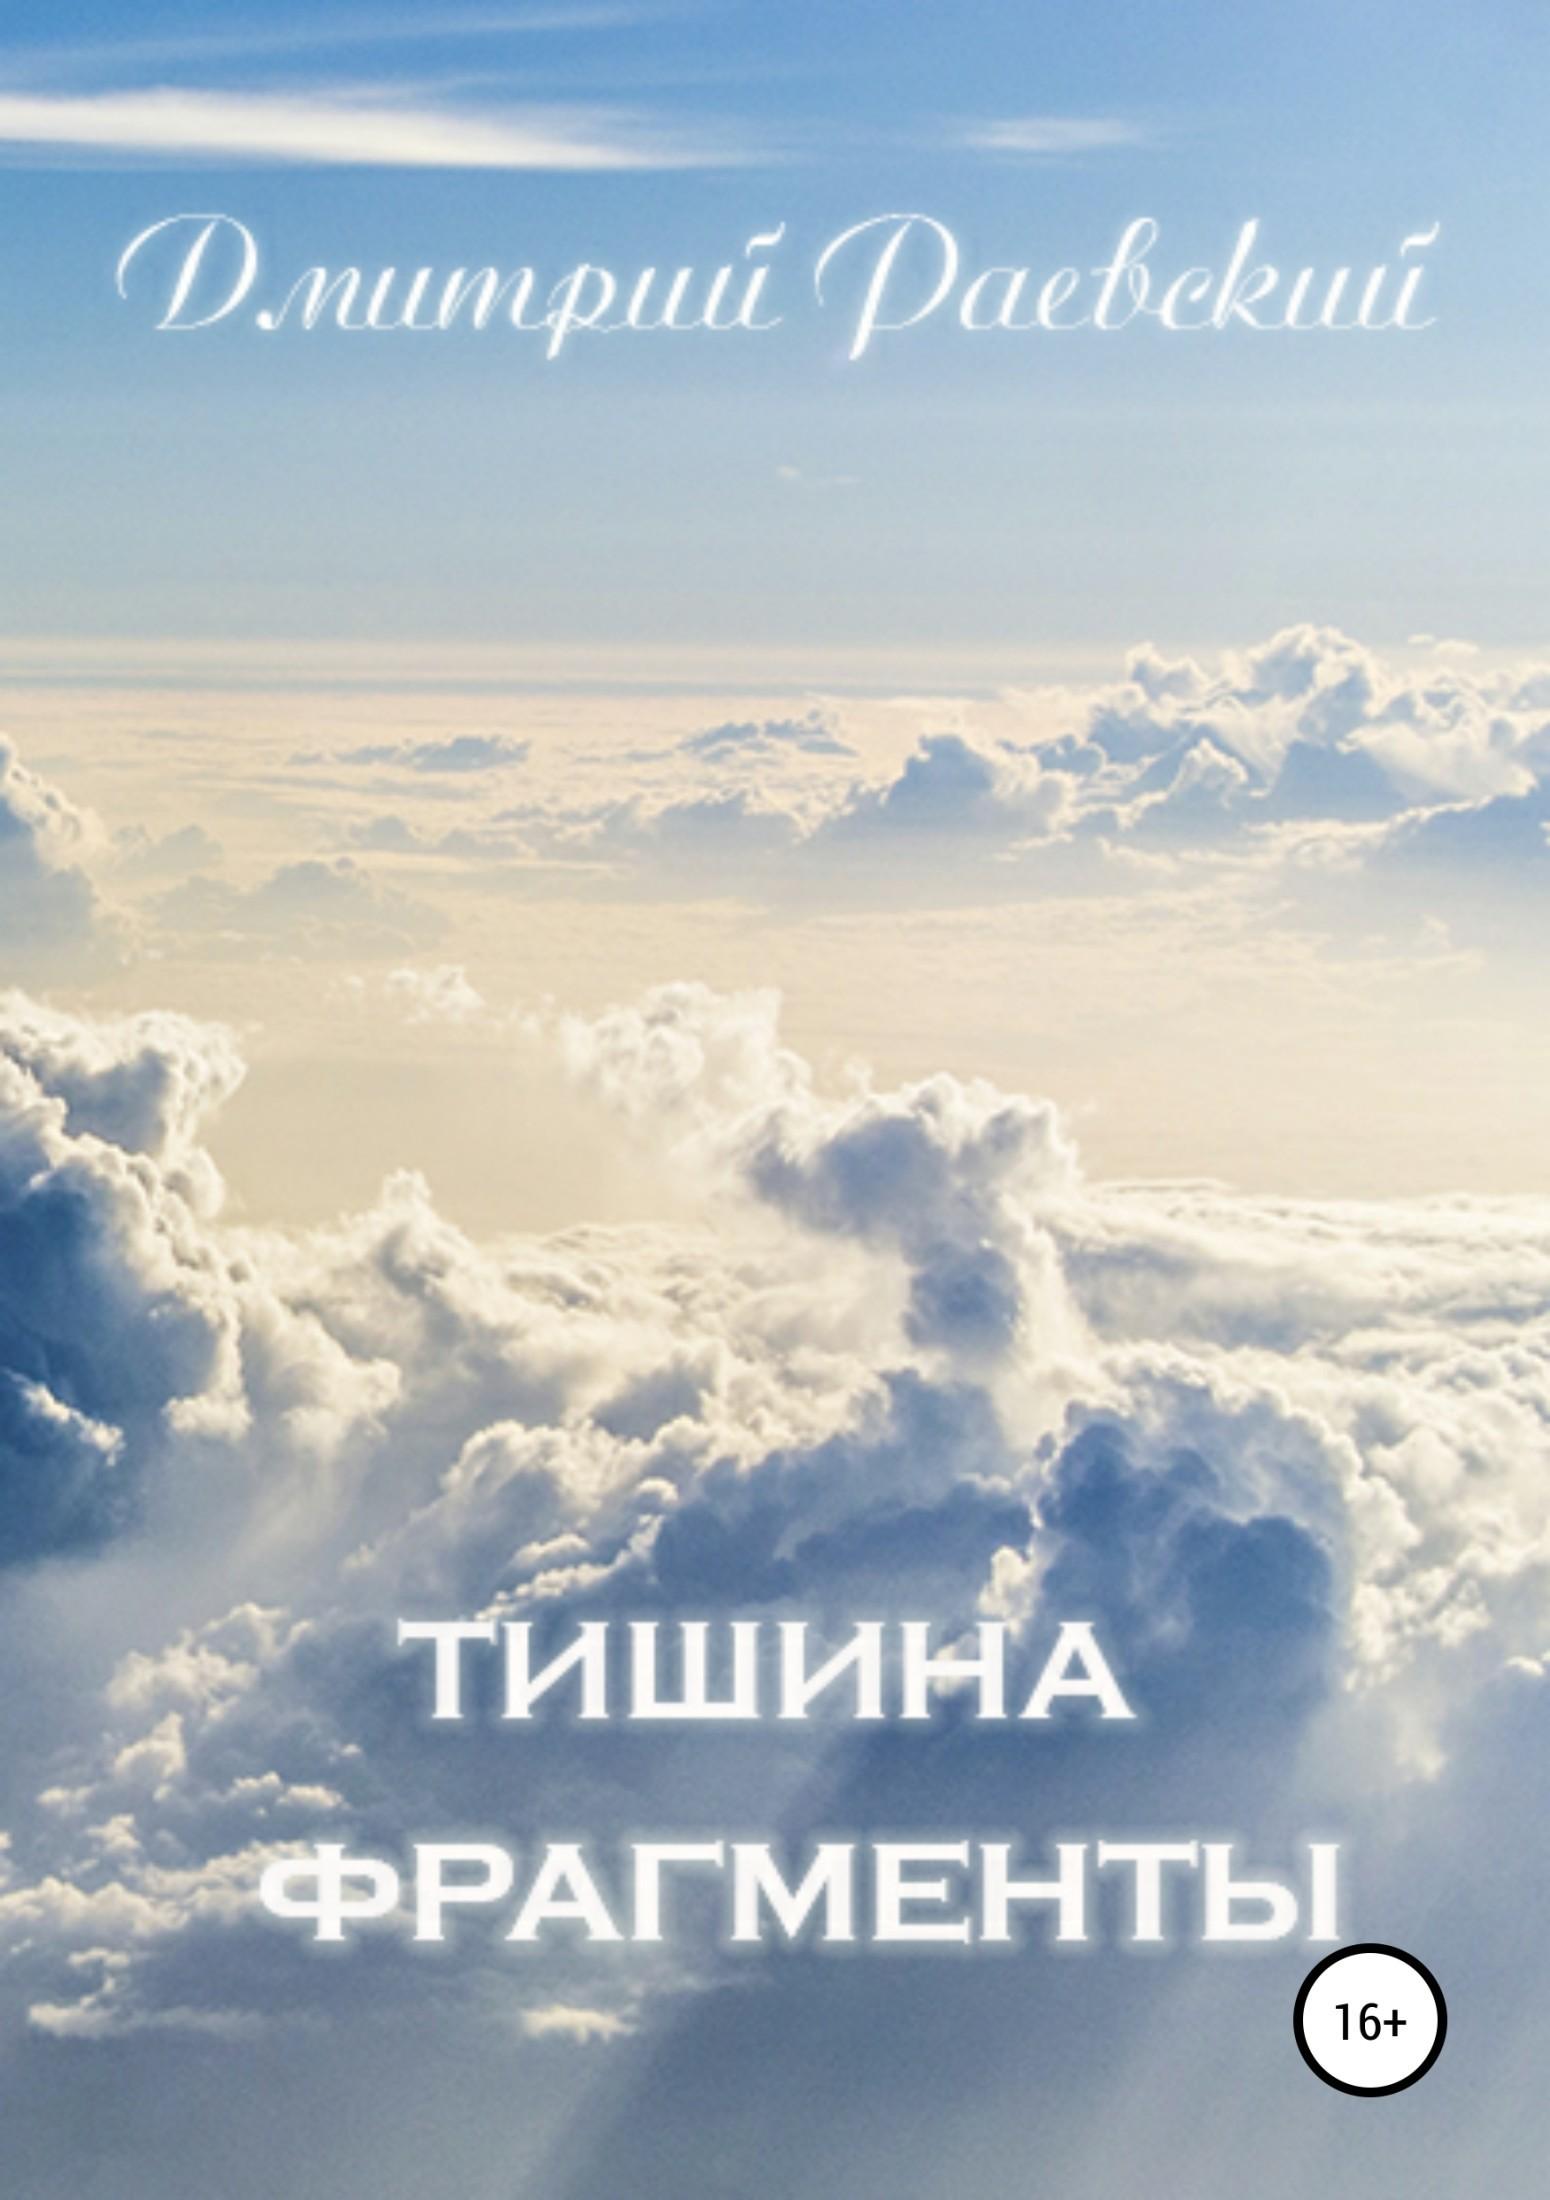 Дмитрий Раевский Тишина. Фрагменты дмитрий раевский тишина фрагменты